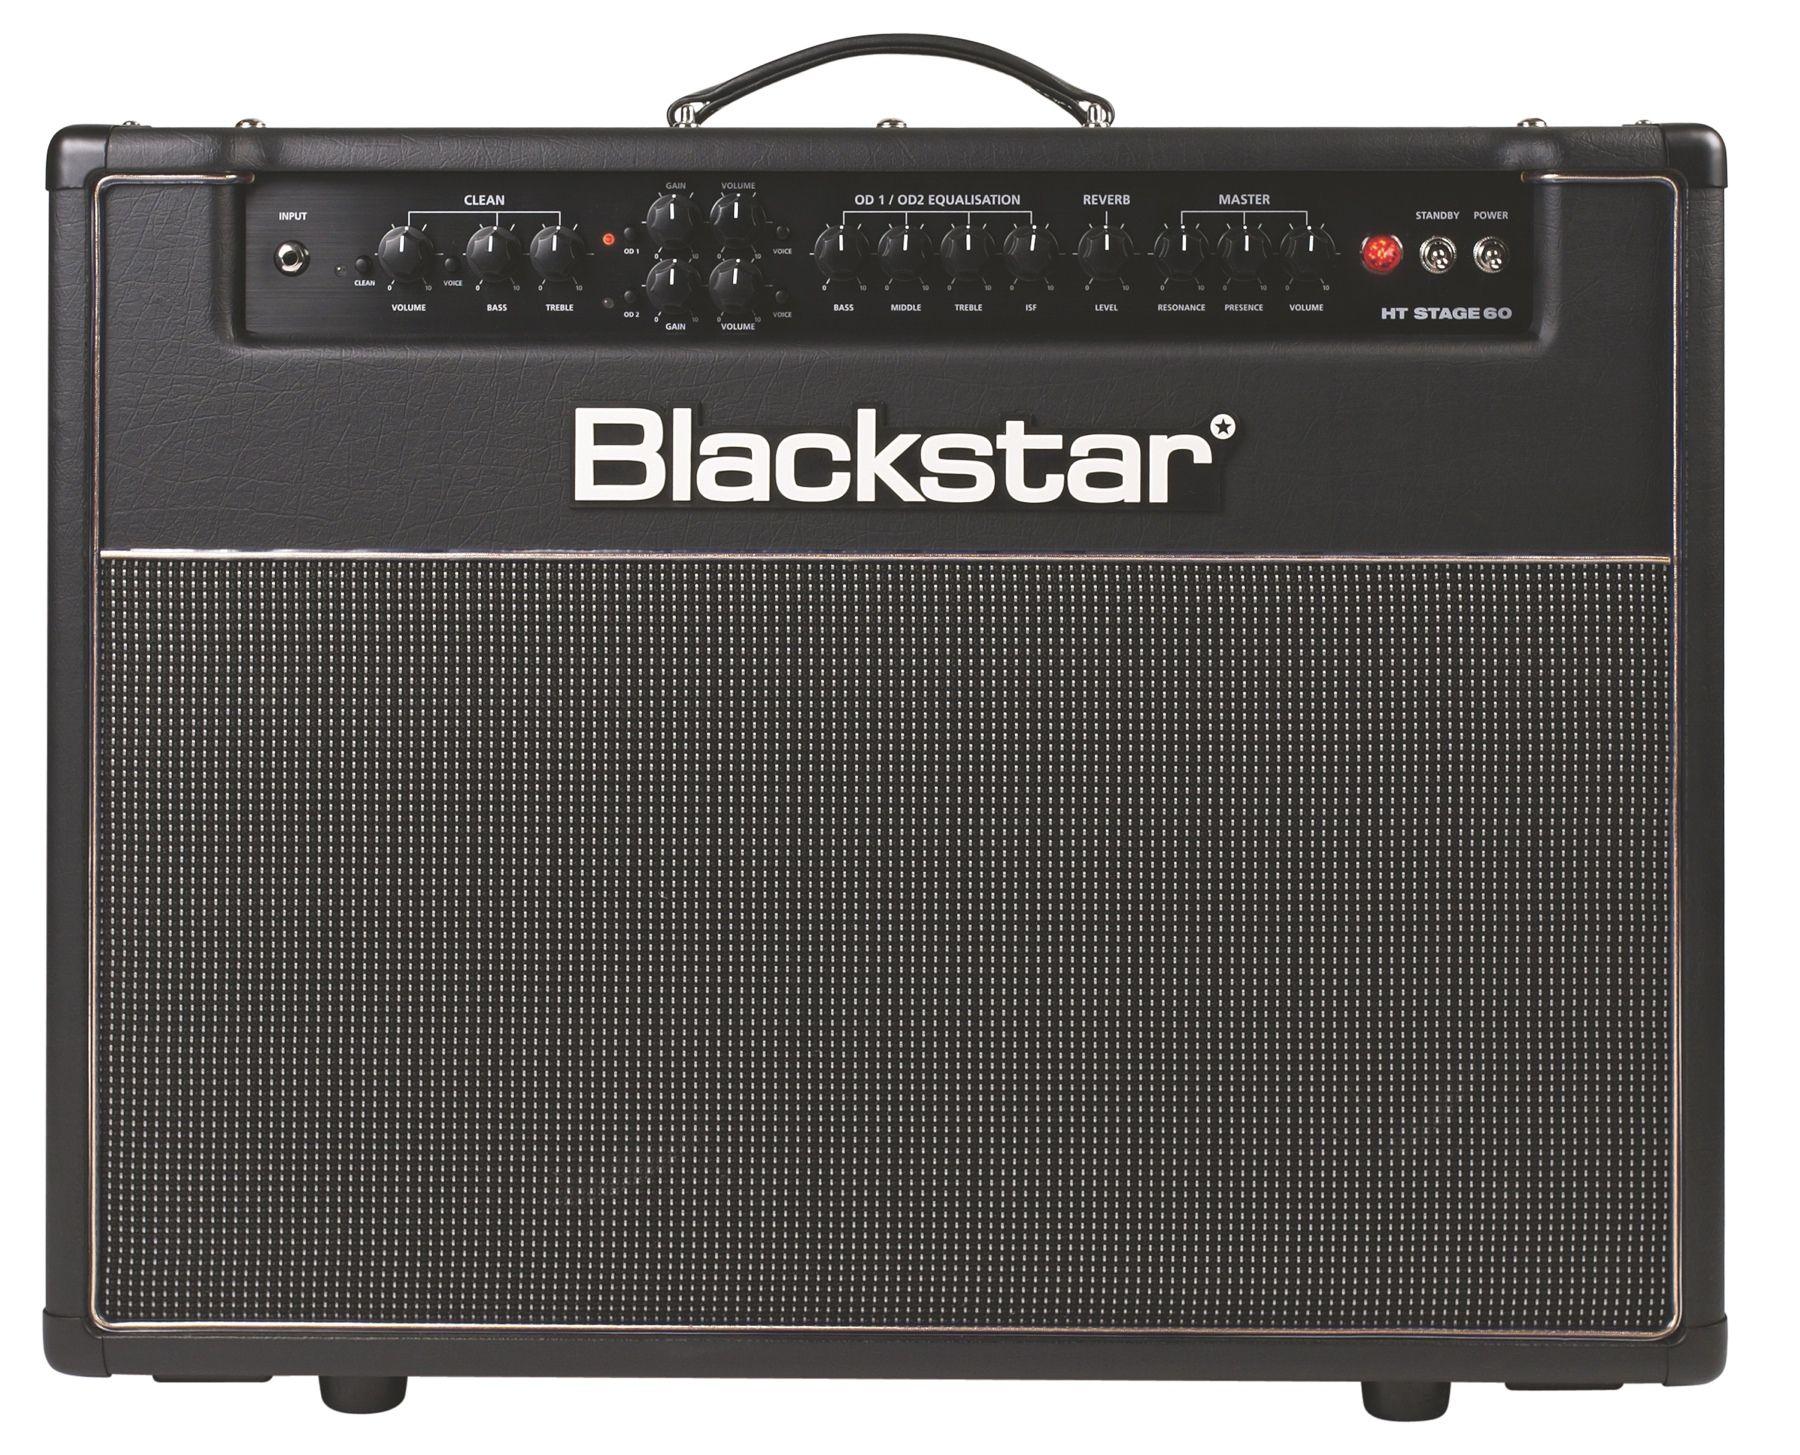 Blackstar ht5r mkii 5watt 1x12 tube combo amp with